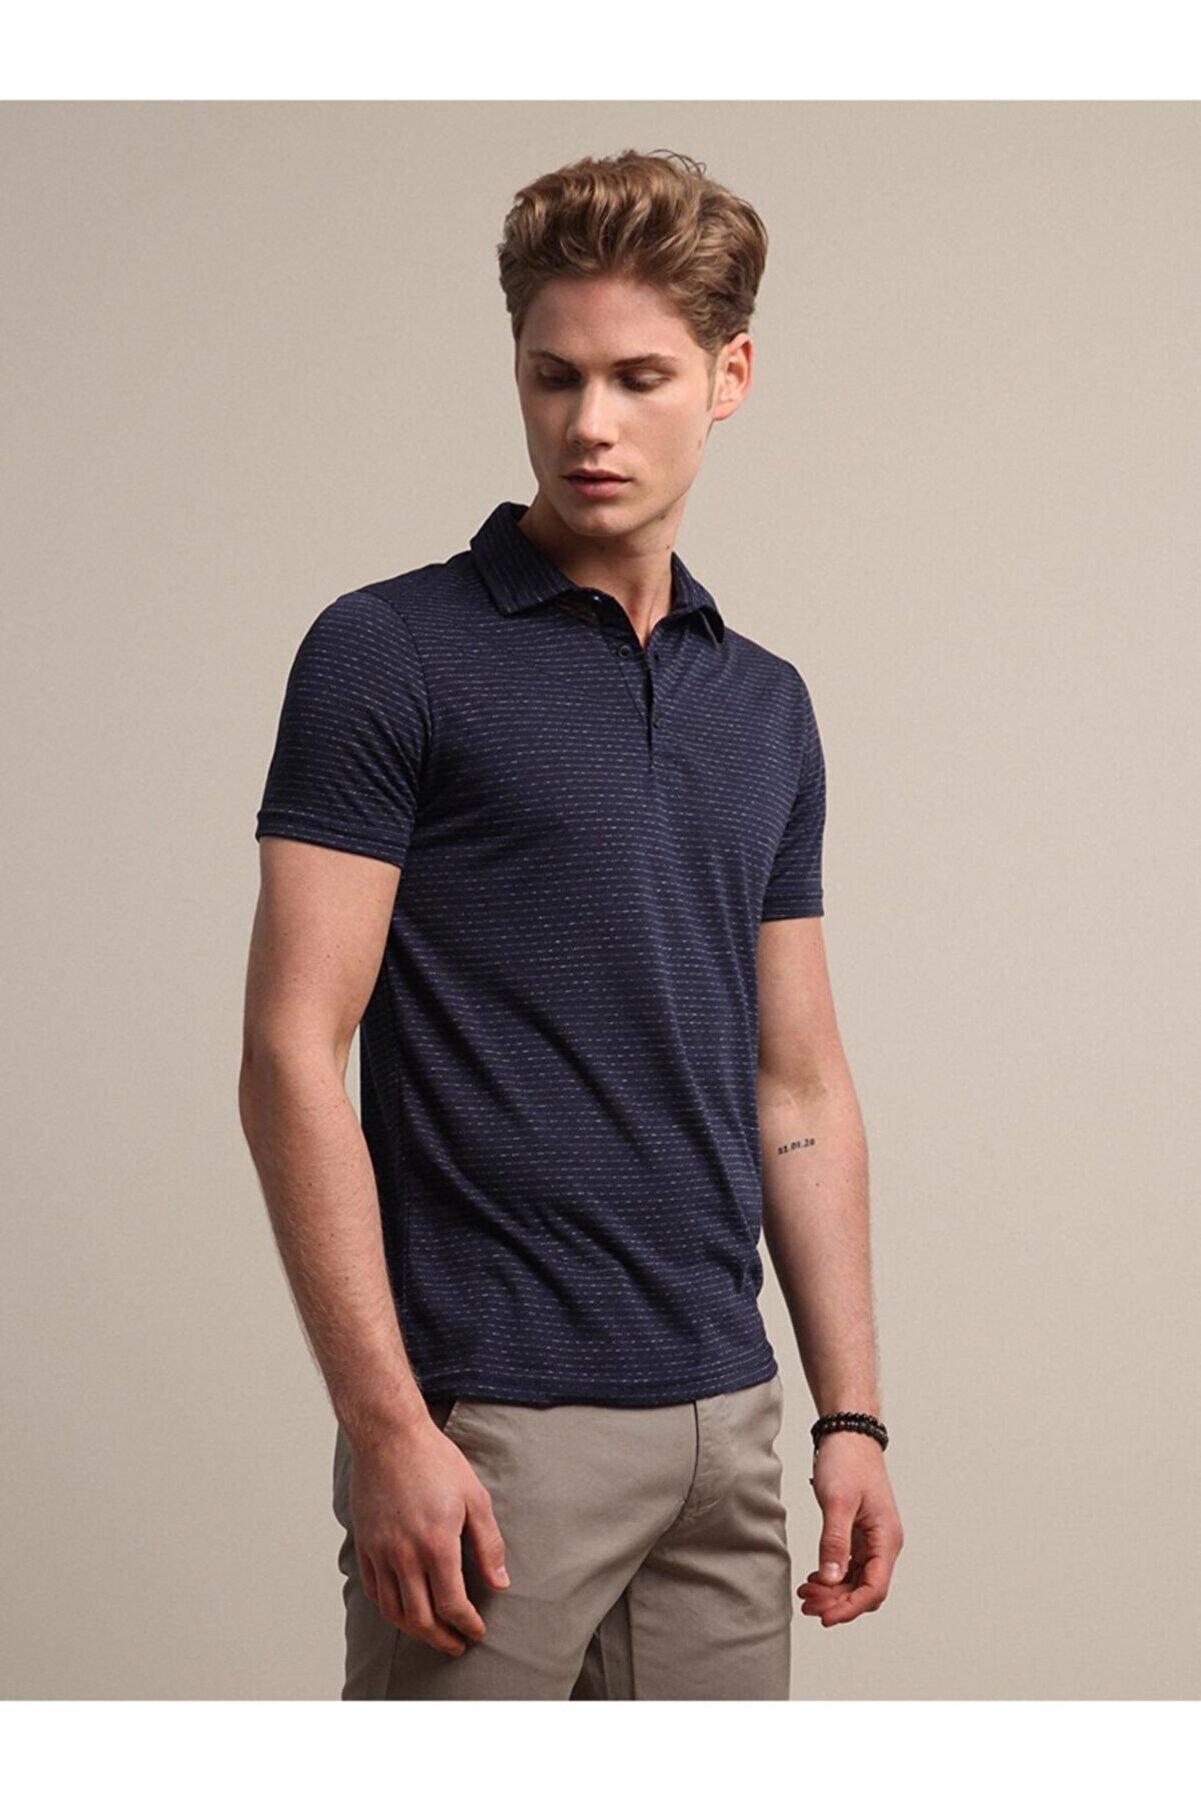 Kip Erkek Lacivert Jakarlı Örme T - Shirt KP10120455